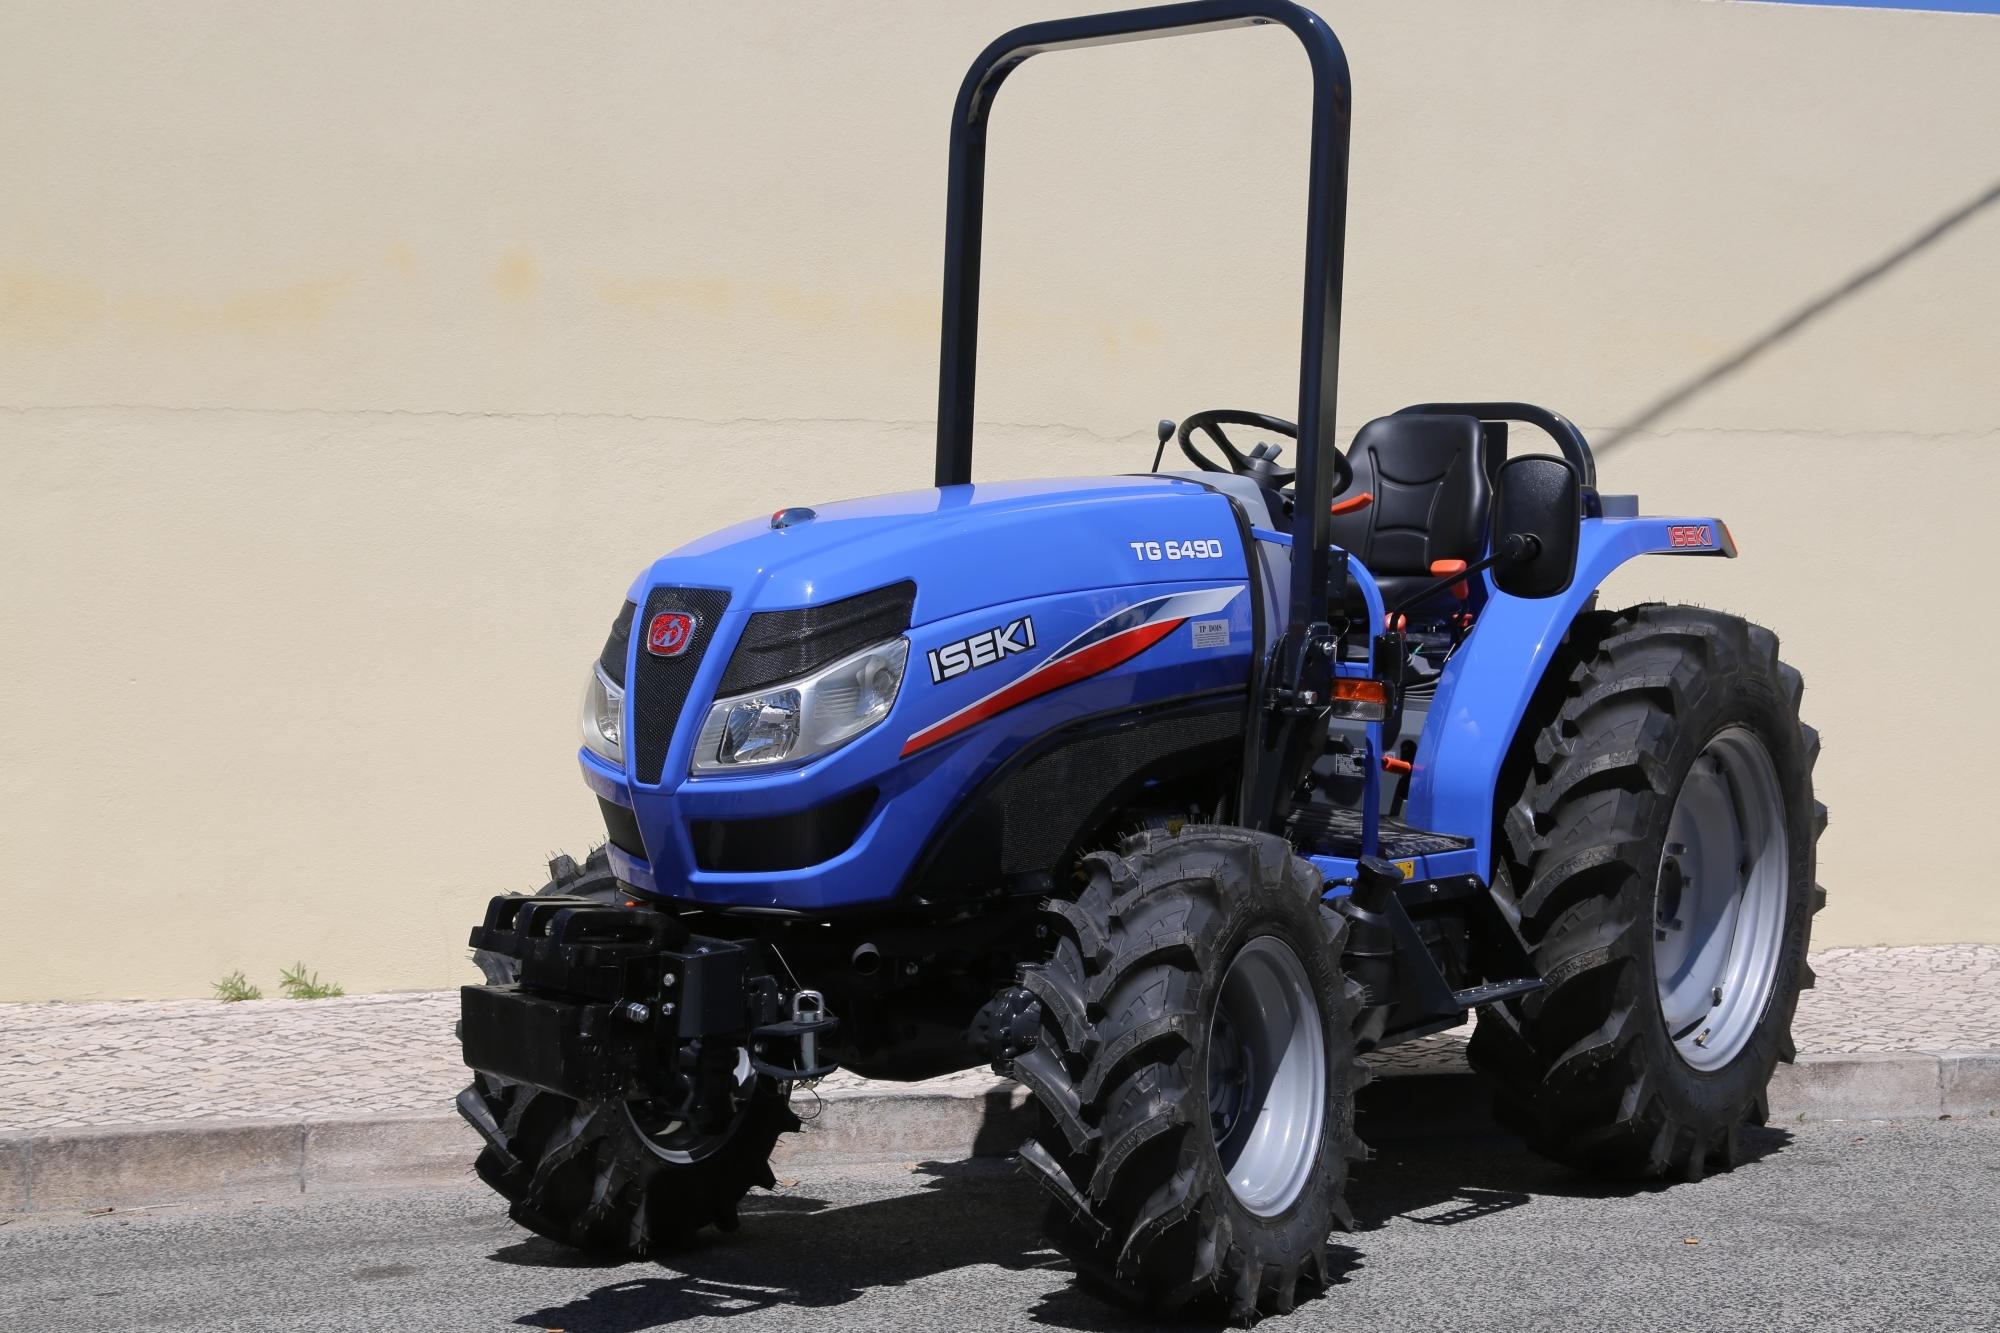 kompaktni-malotraktor-iseki-tg-6490-al-0